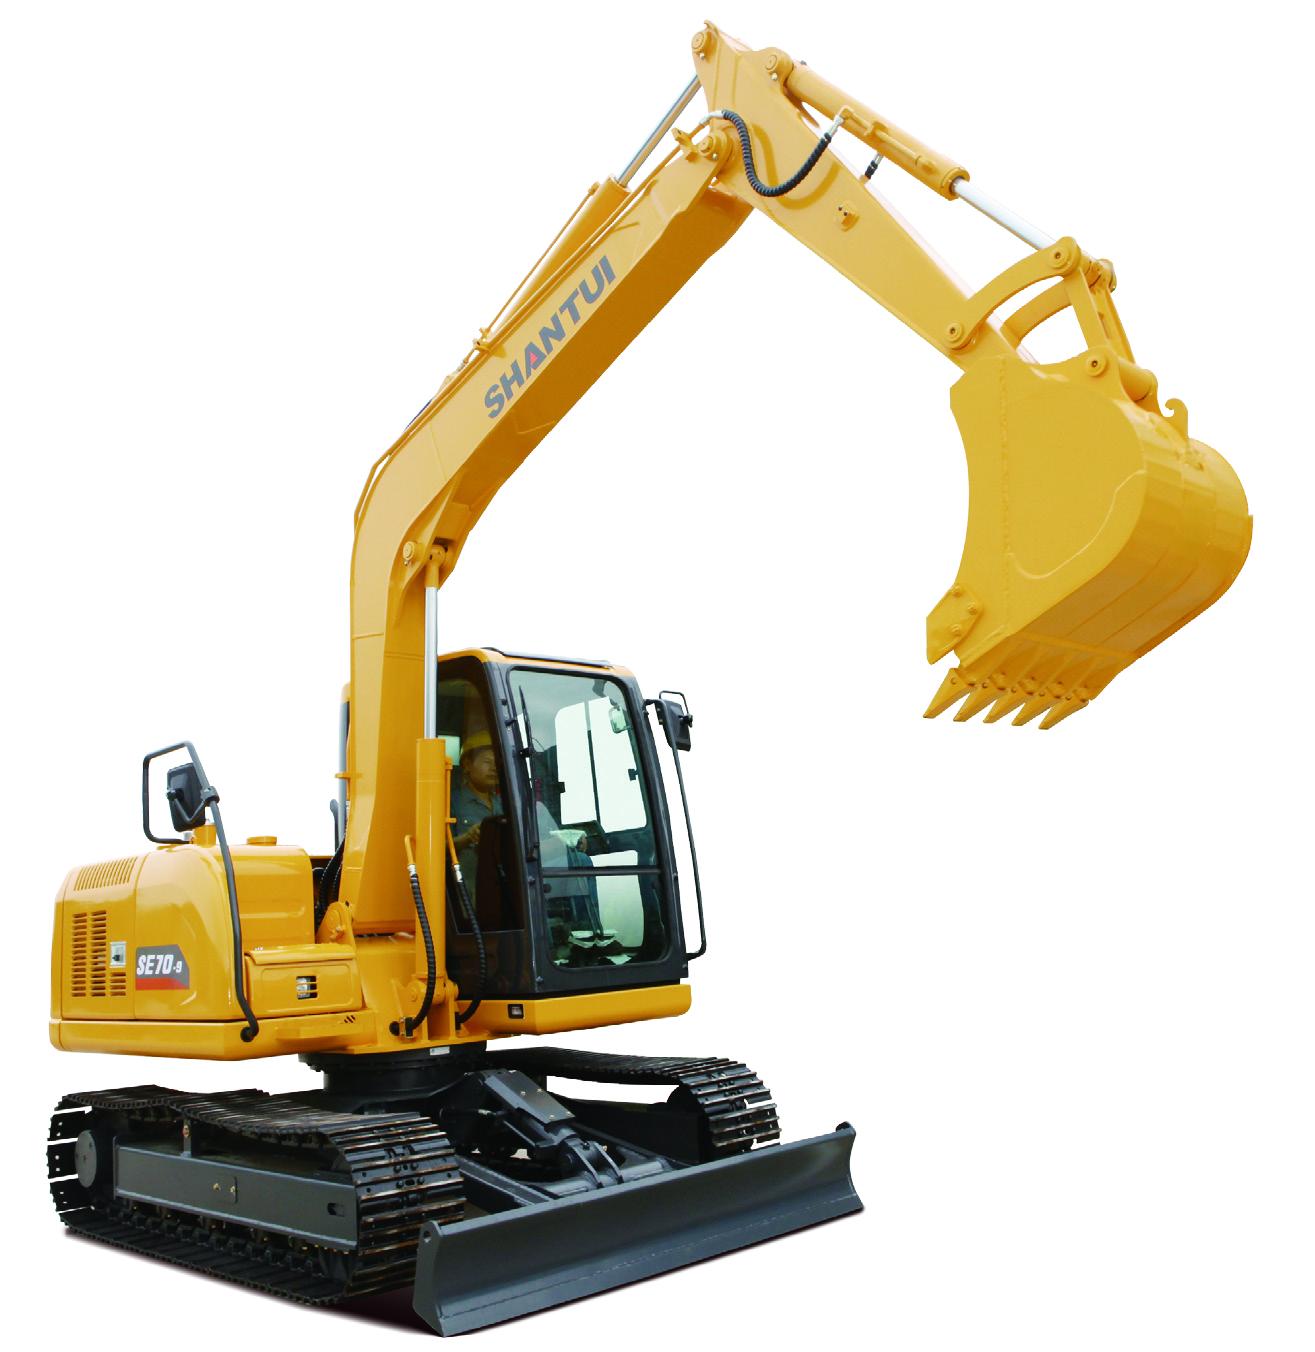 Shantui Small 7.65ton Crawler Excavator